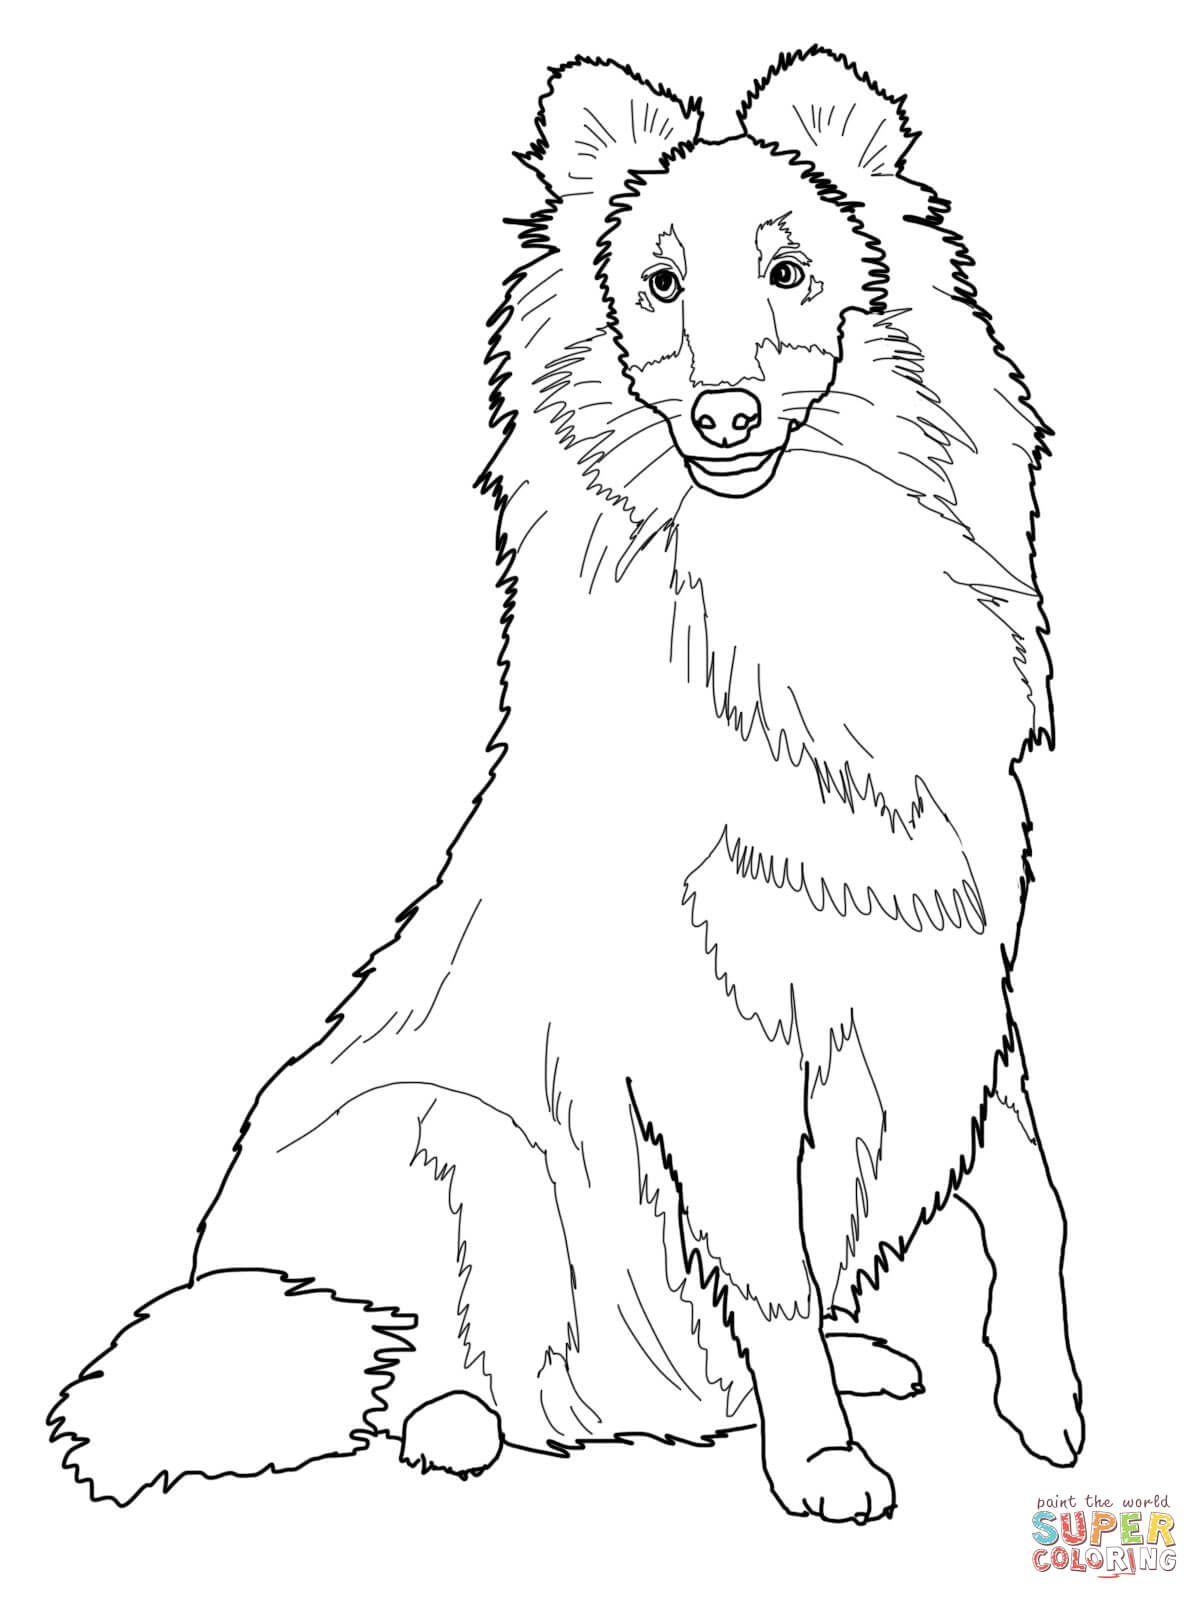 Sheltie Shetland Sheepdog Coloring Page Free Printable Coloring Pages Dog Coloring Page Shetland Sheepdog Blue Merle Shetland Sheepdog